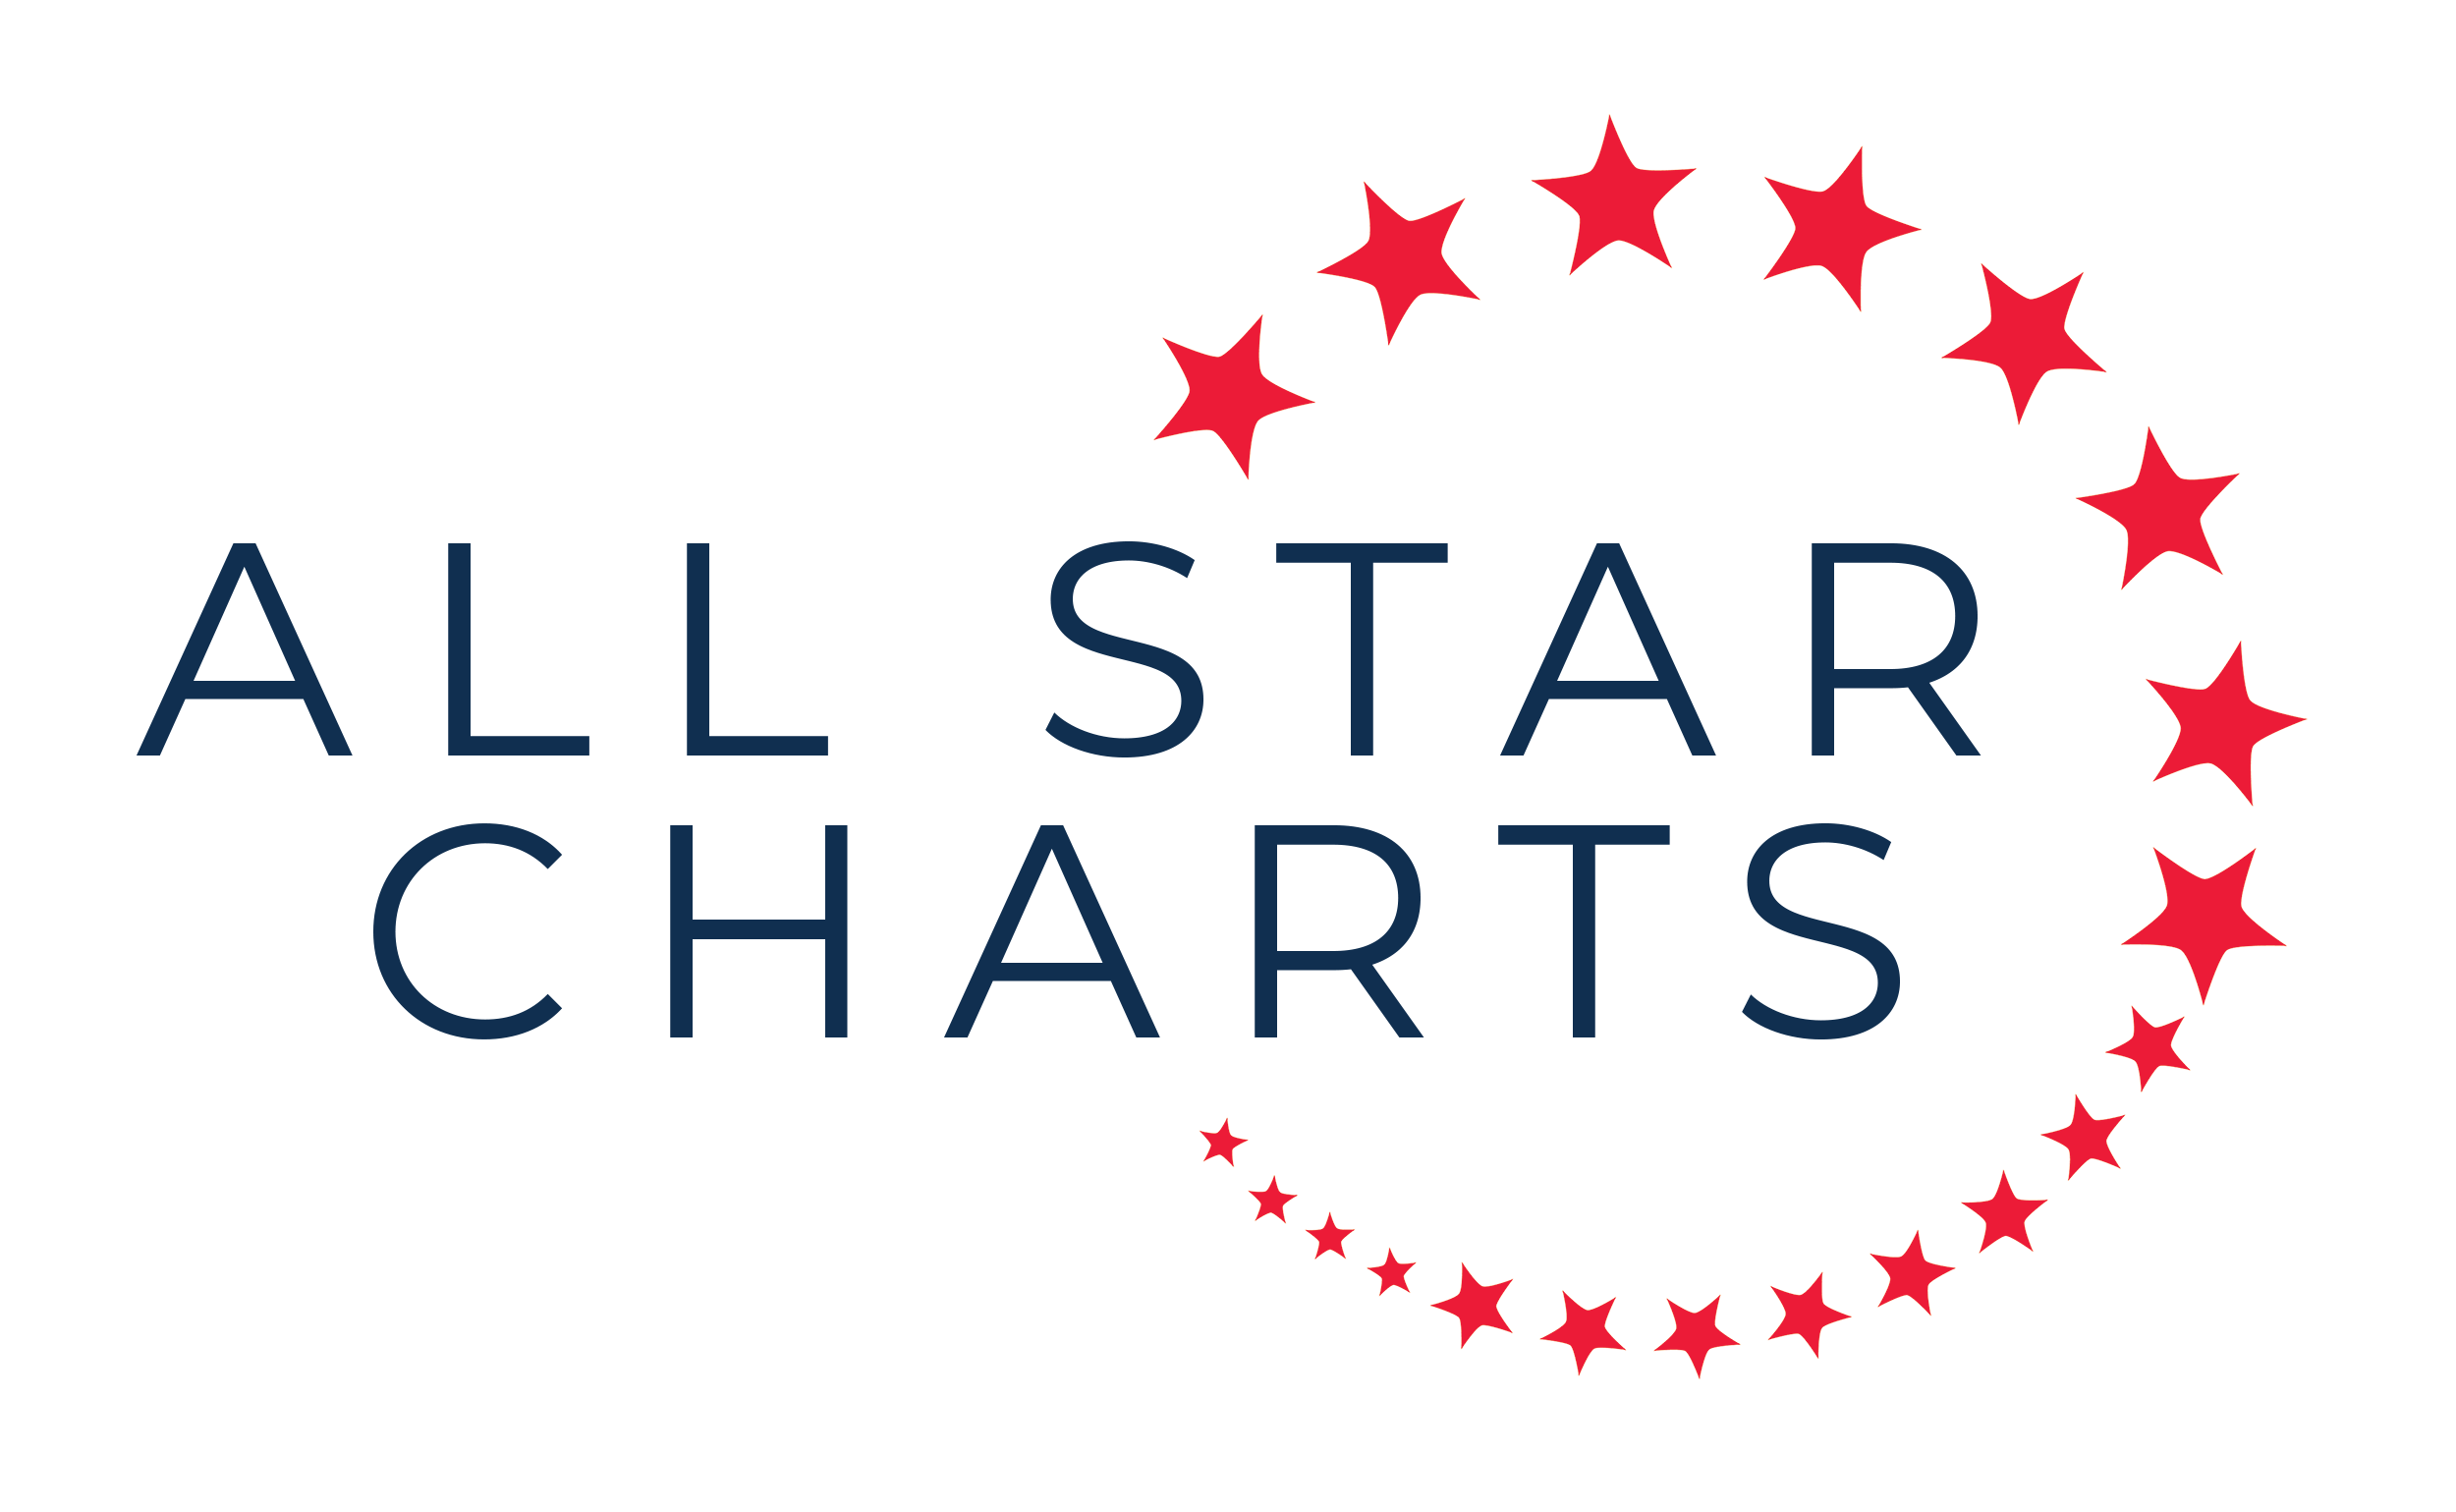 All Star Charts Premium Membership